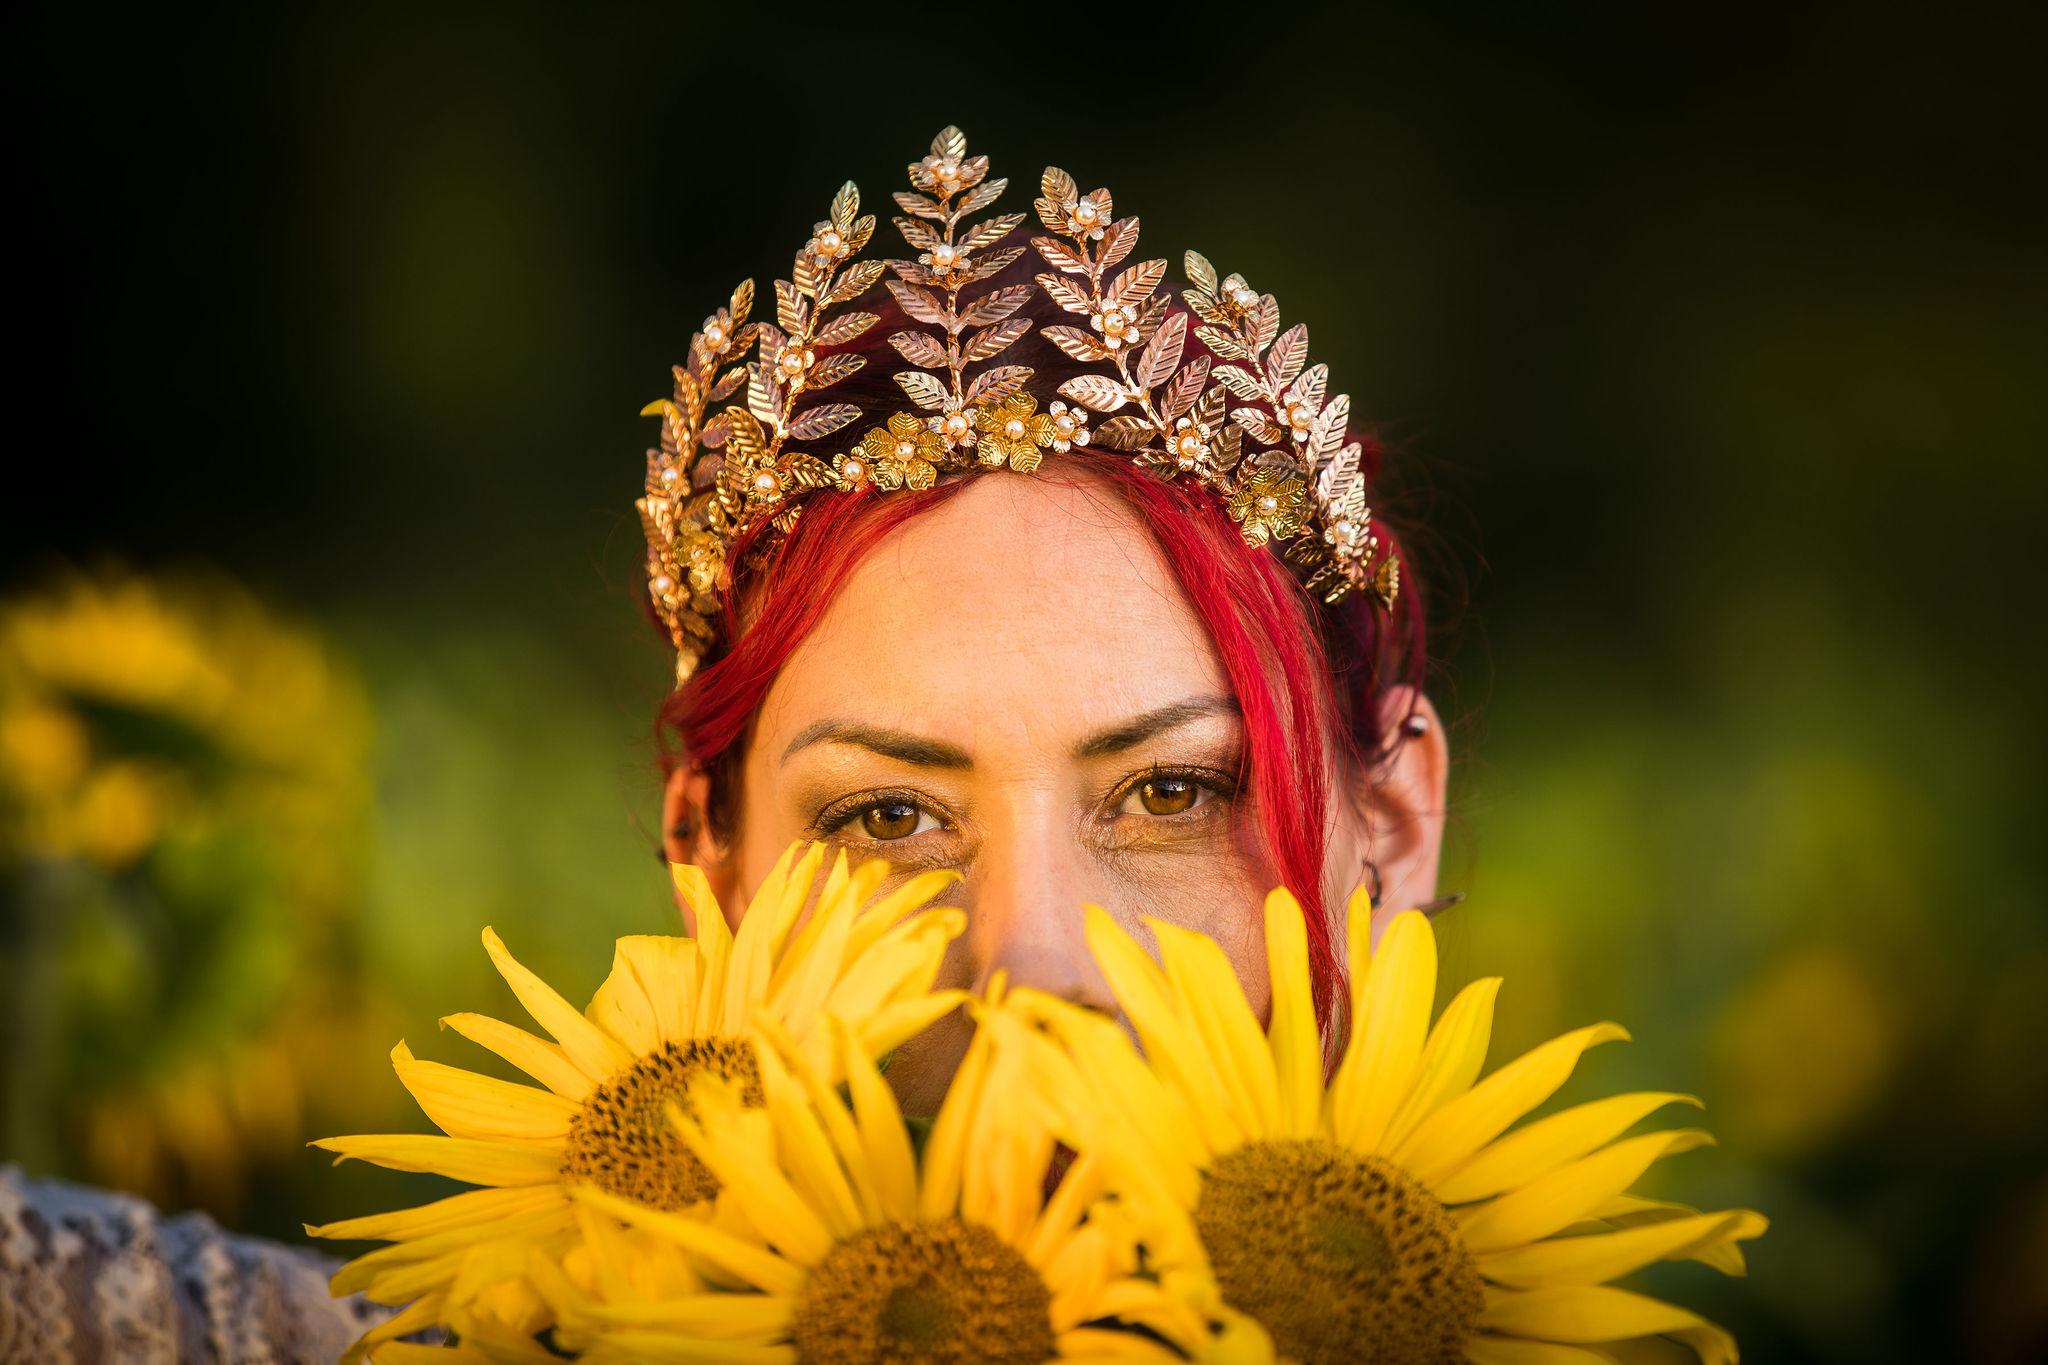 sunflower themed wedding - unconventional wedding - sunflower wedding - autumn wedding - alternative wedding planning - wedding crown- wedding tiara